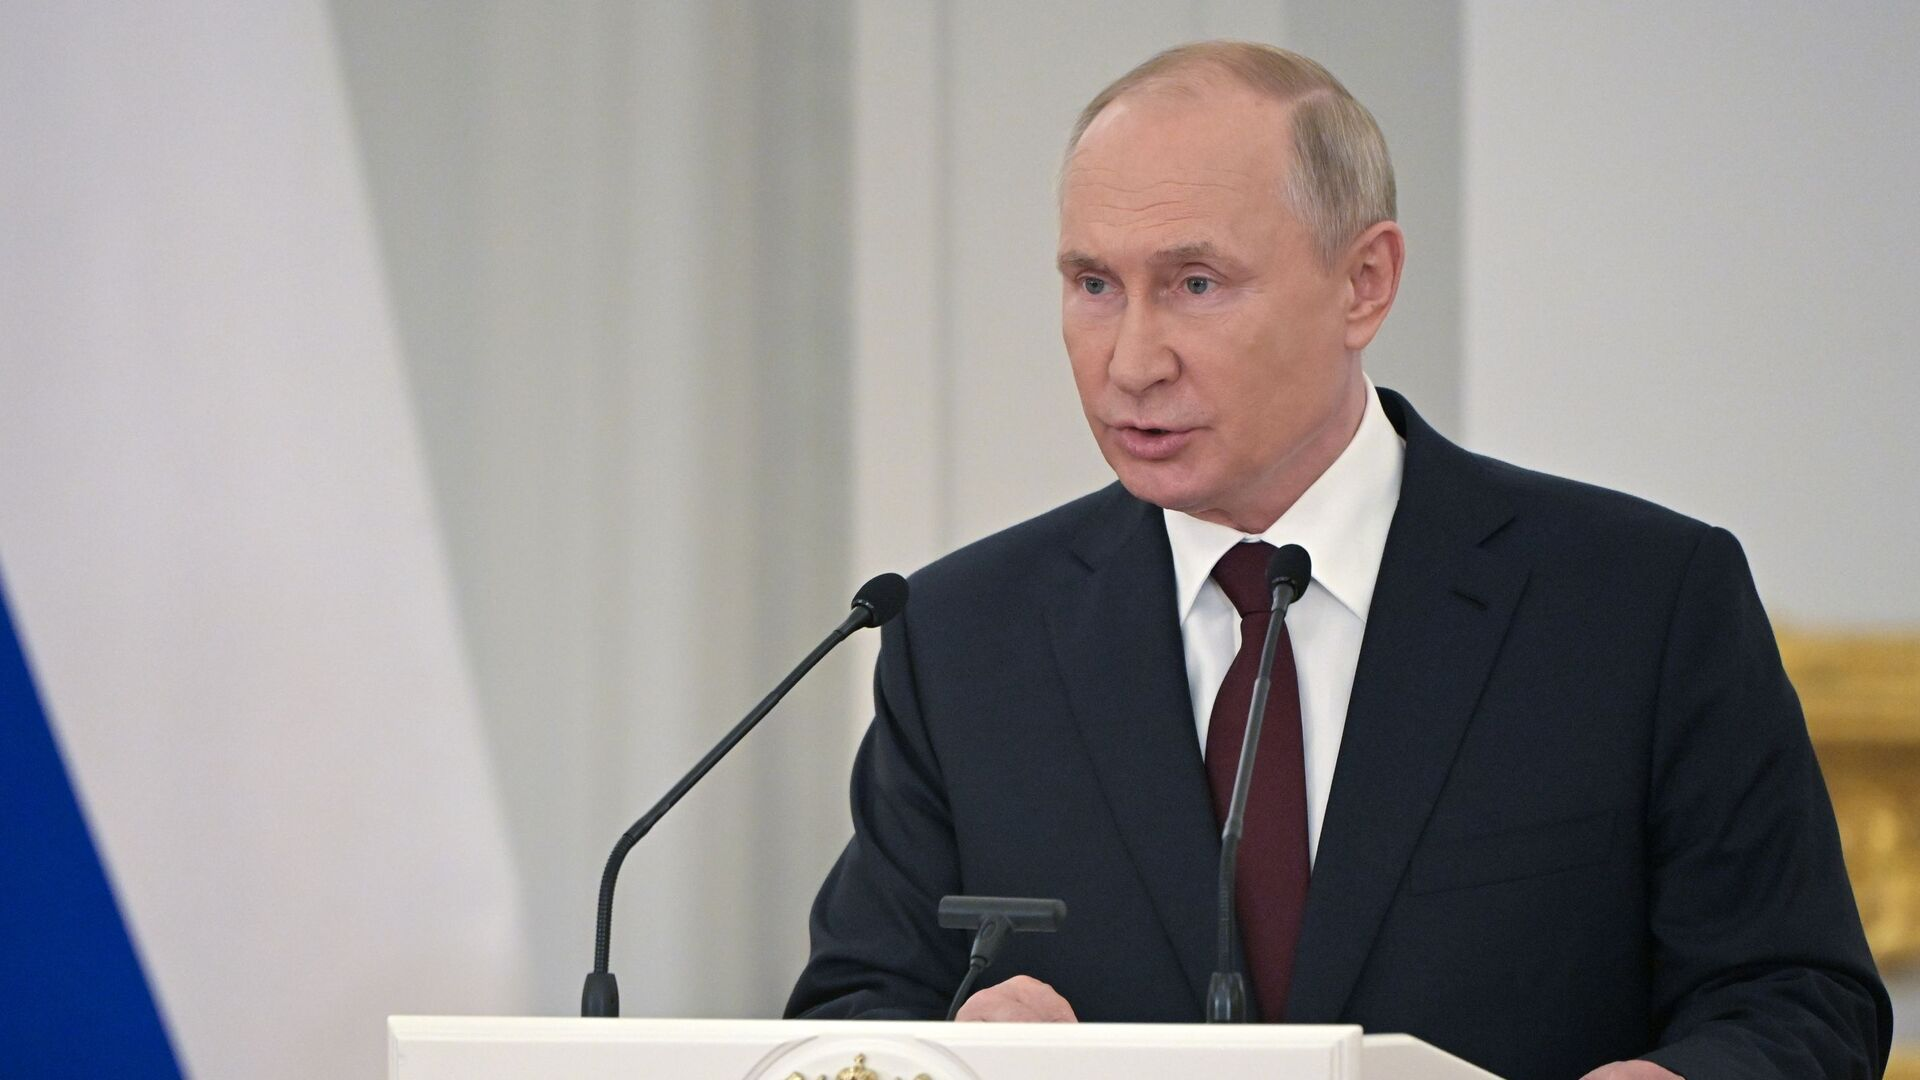 Predsednik Rusije Vladimir Putin - Sputnik Srbija, 1920, 01.09.2021